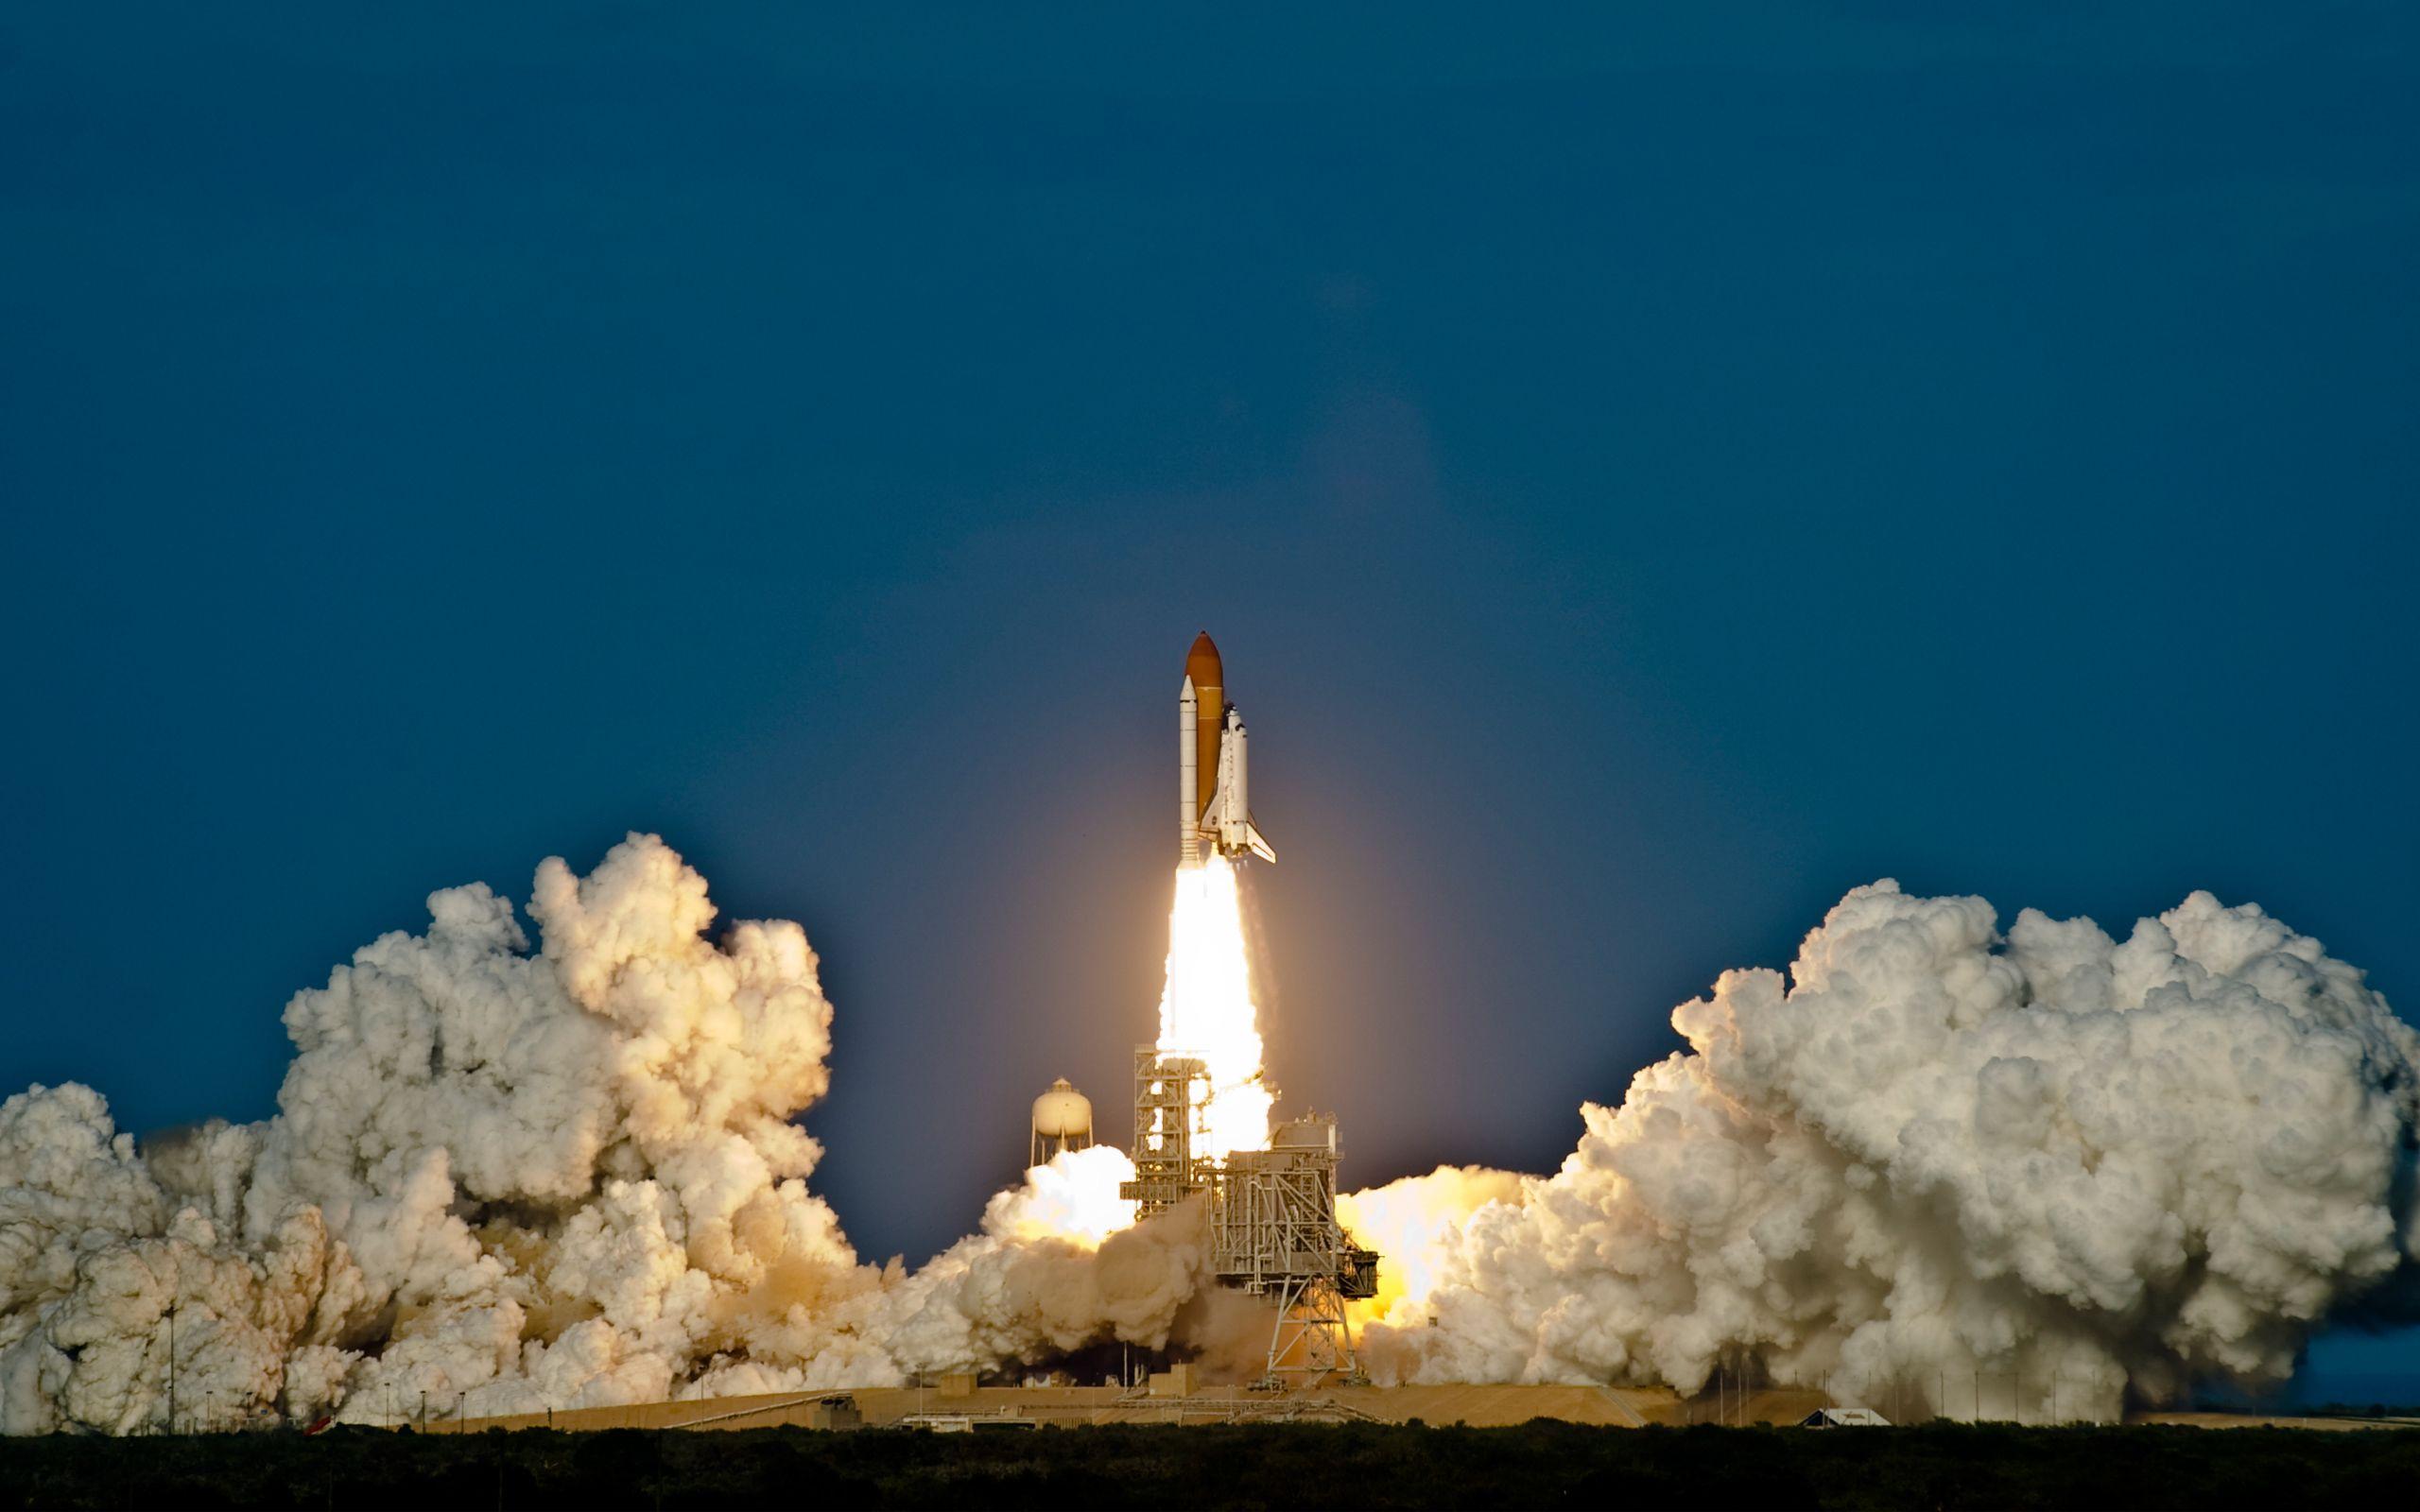 Space Shuttle Discovery Launch Wide Jpg Jpeg Image 2560 1600 Pixels Space Shuttle Nasa Space Shuttle Nasa Space Program